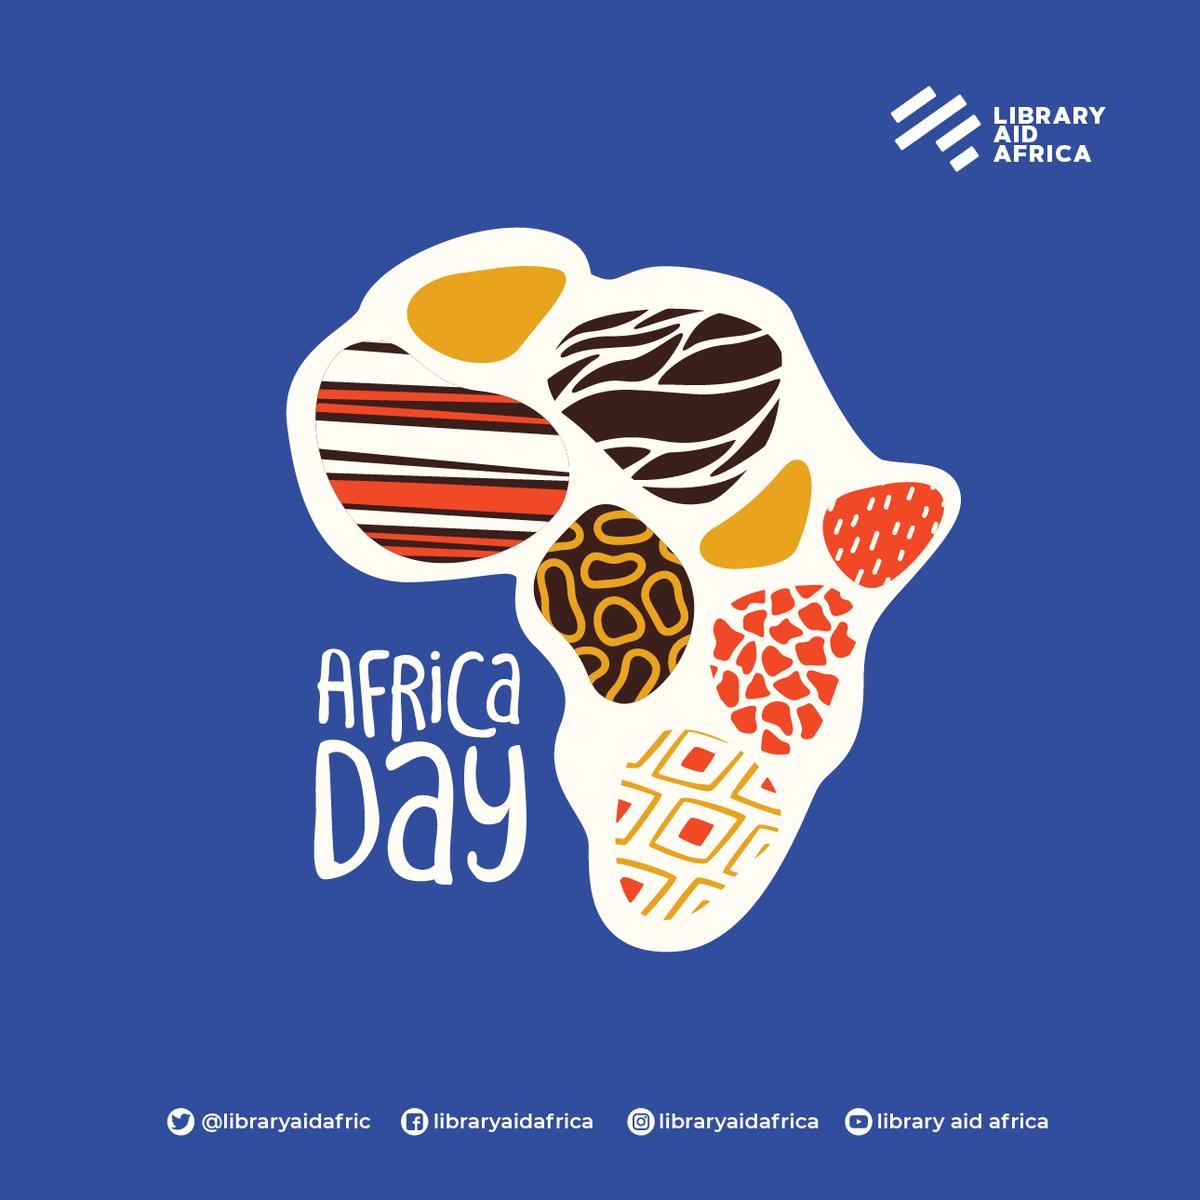 Today we celebrate #Africa.   Sisi ni Waafrika  Happy #AfricaDaypic.twitter.com/wRlxESFxcc